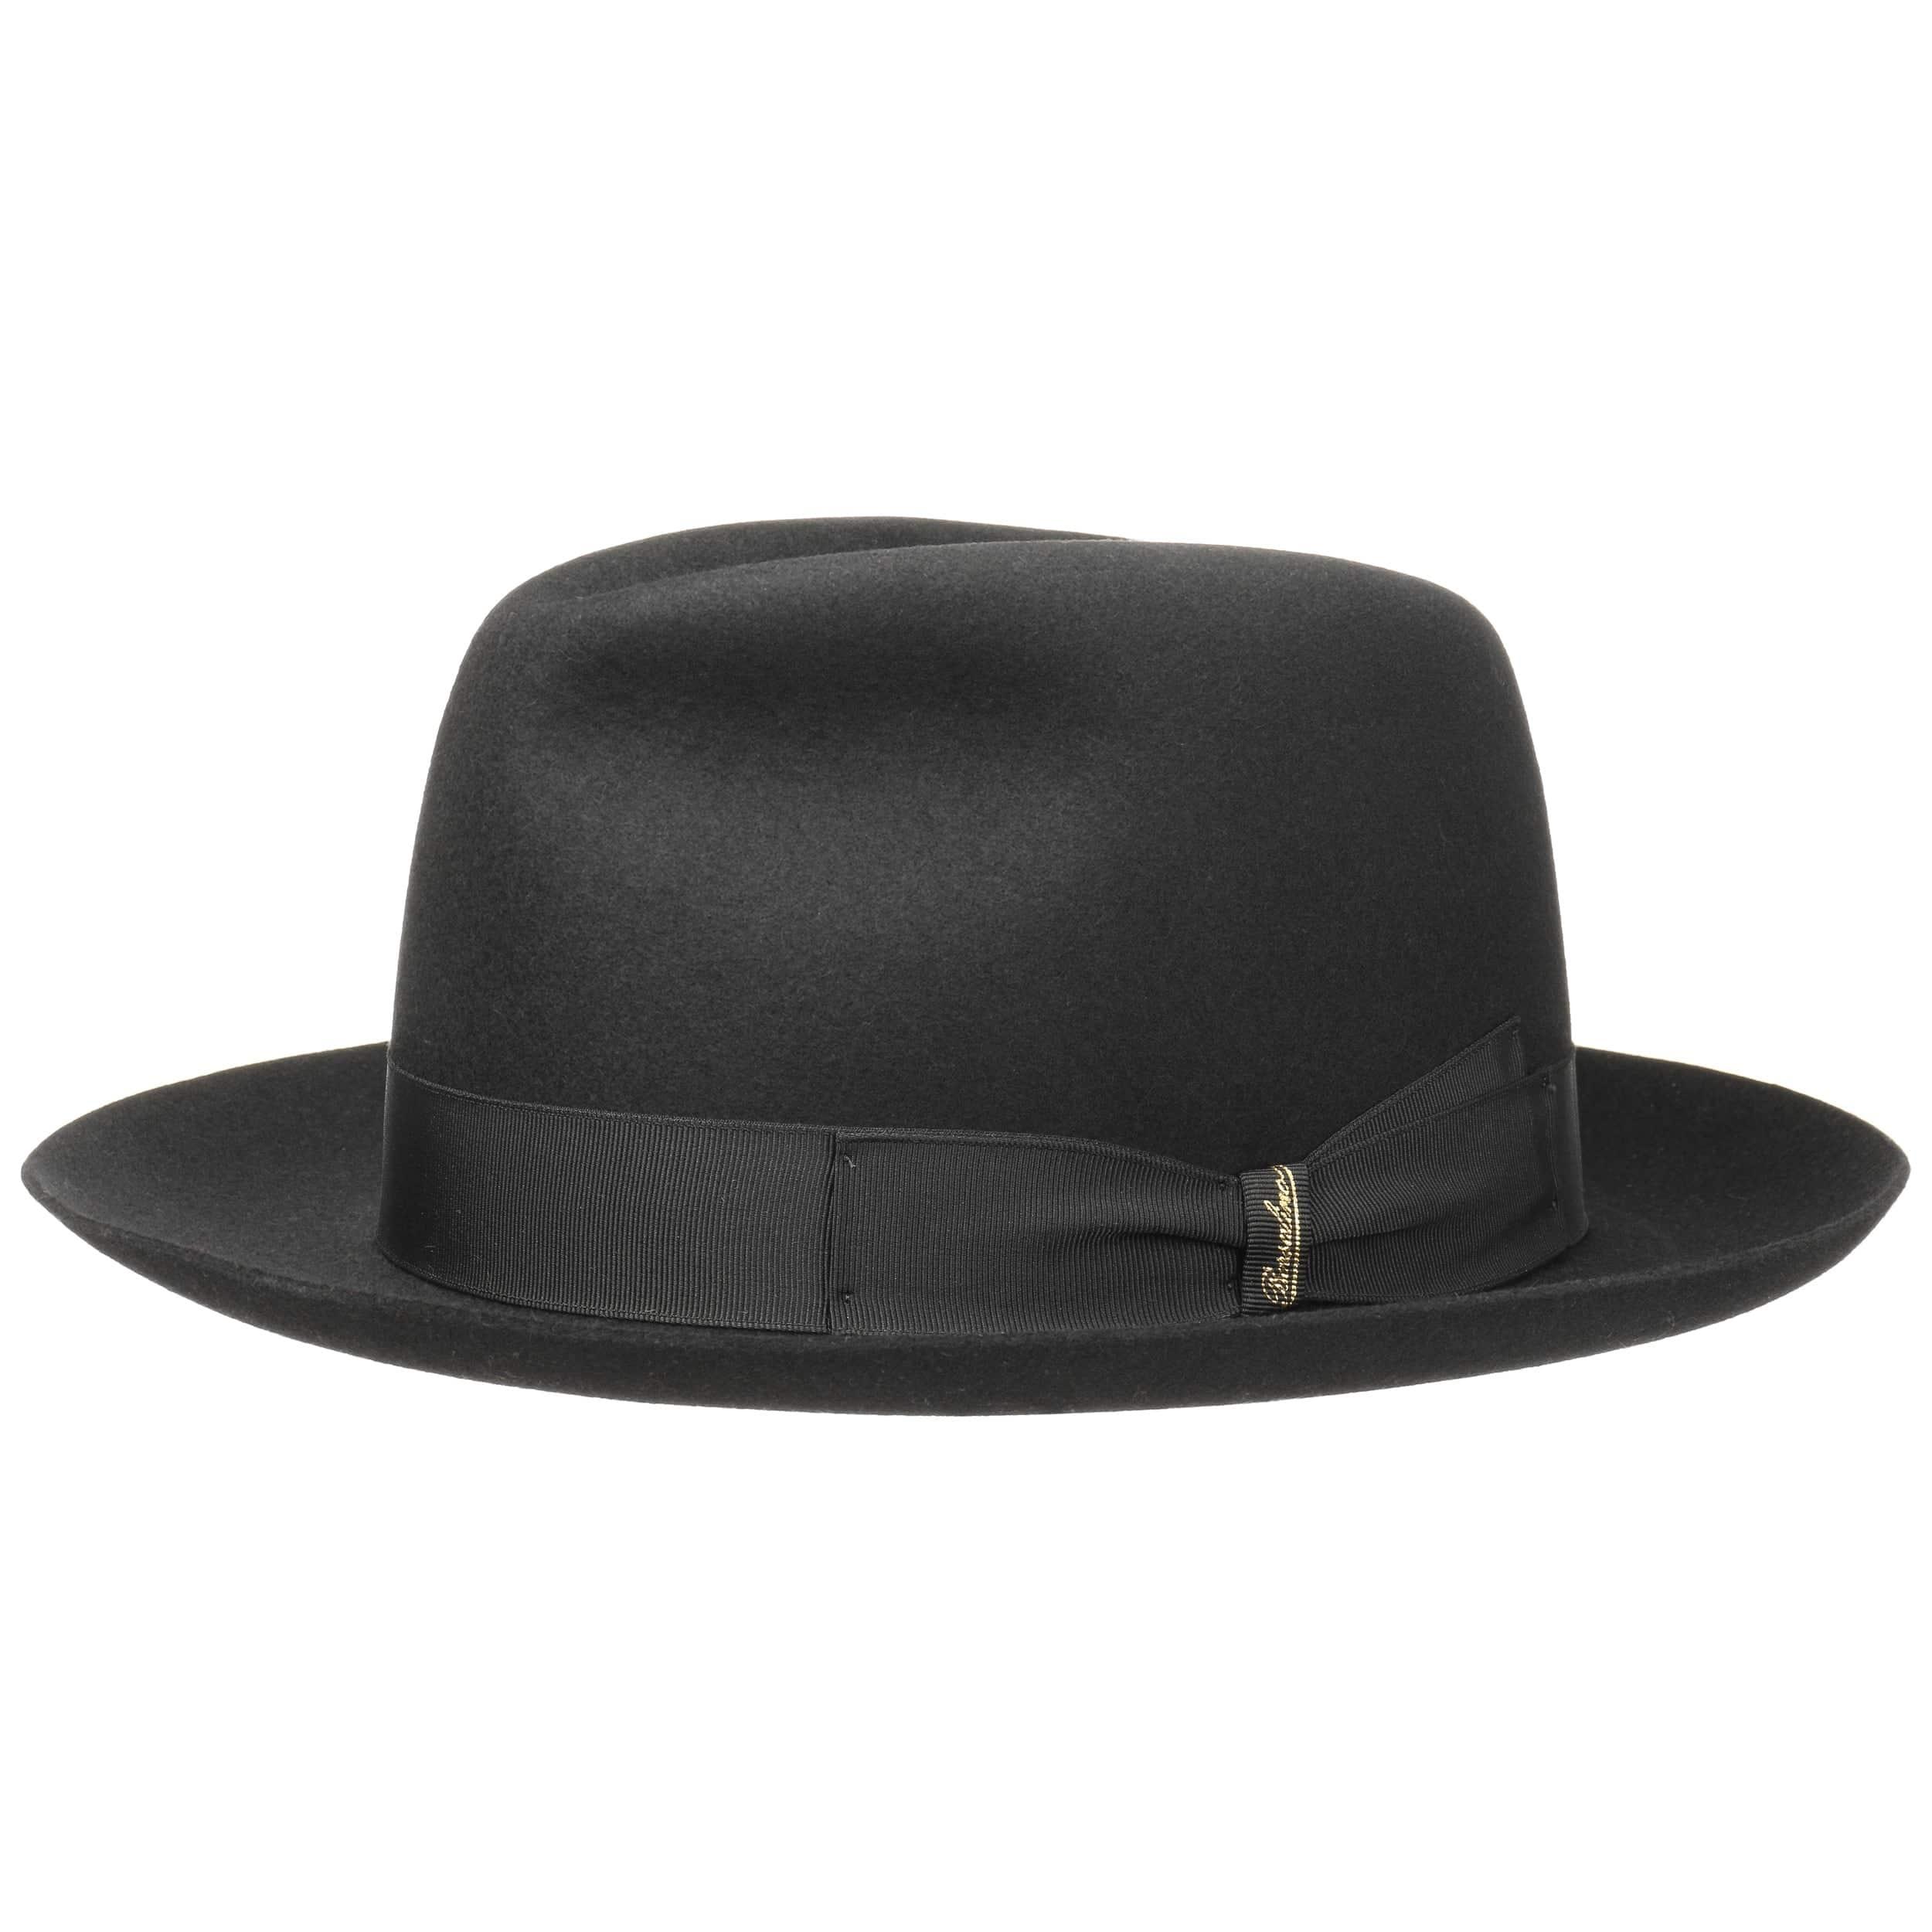 ... Alessandria Rainproof Hat by Borsalino - black 4 ... 20c9d1eb15b